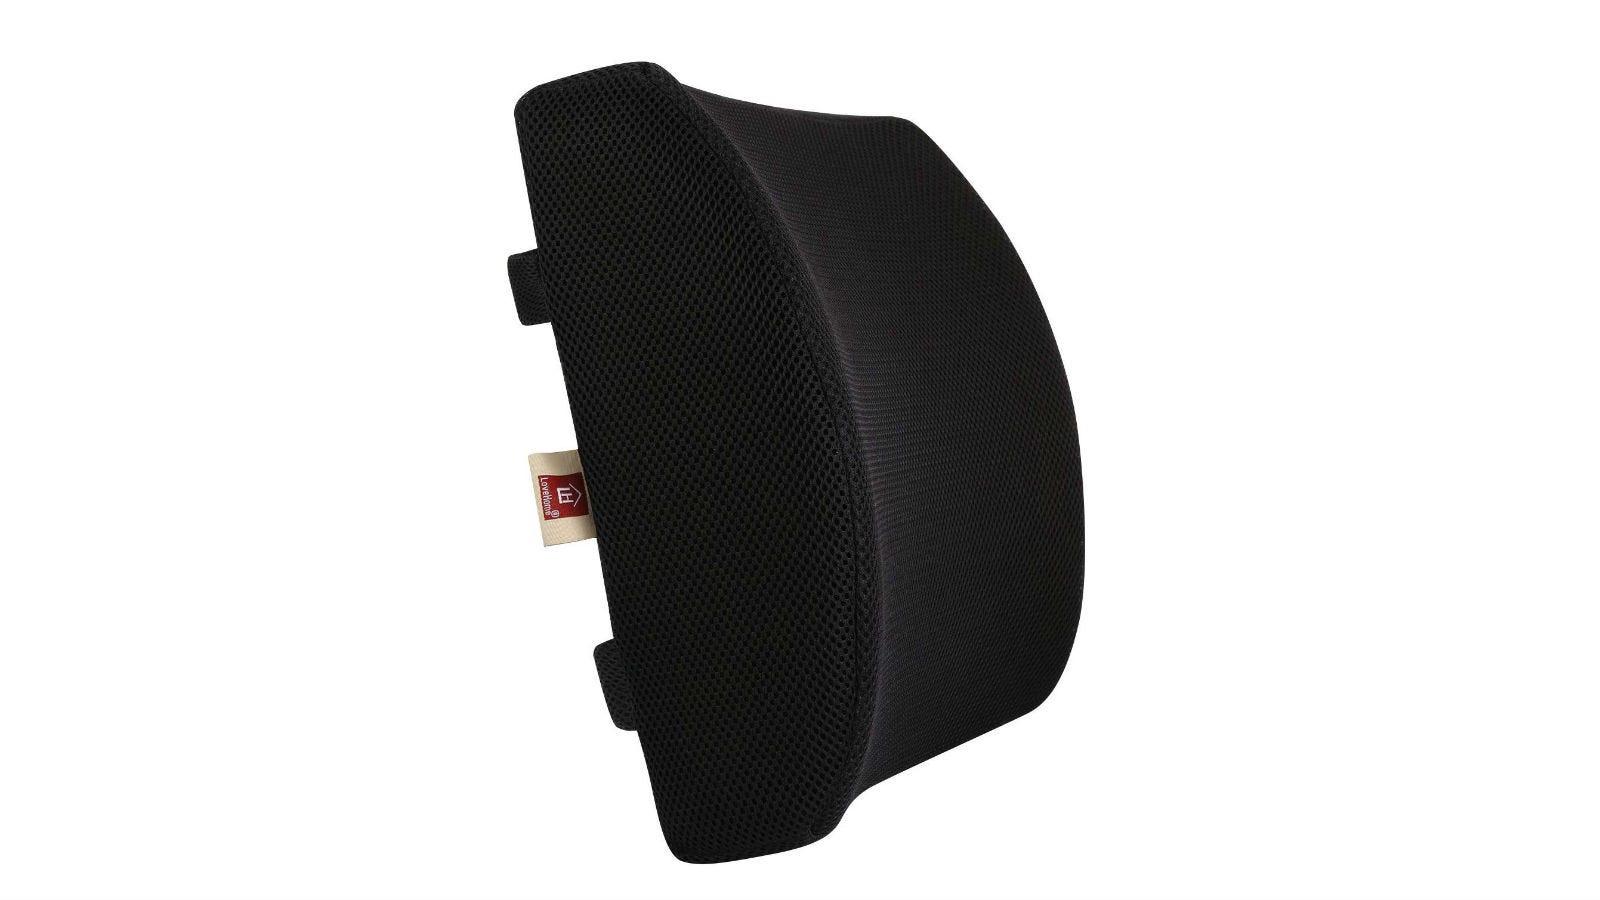 LoveHome Memory Foam Lumbar Support Back Pillow